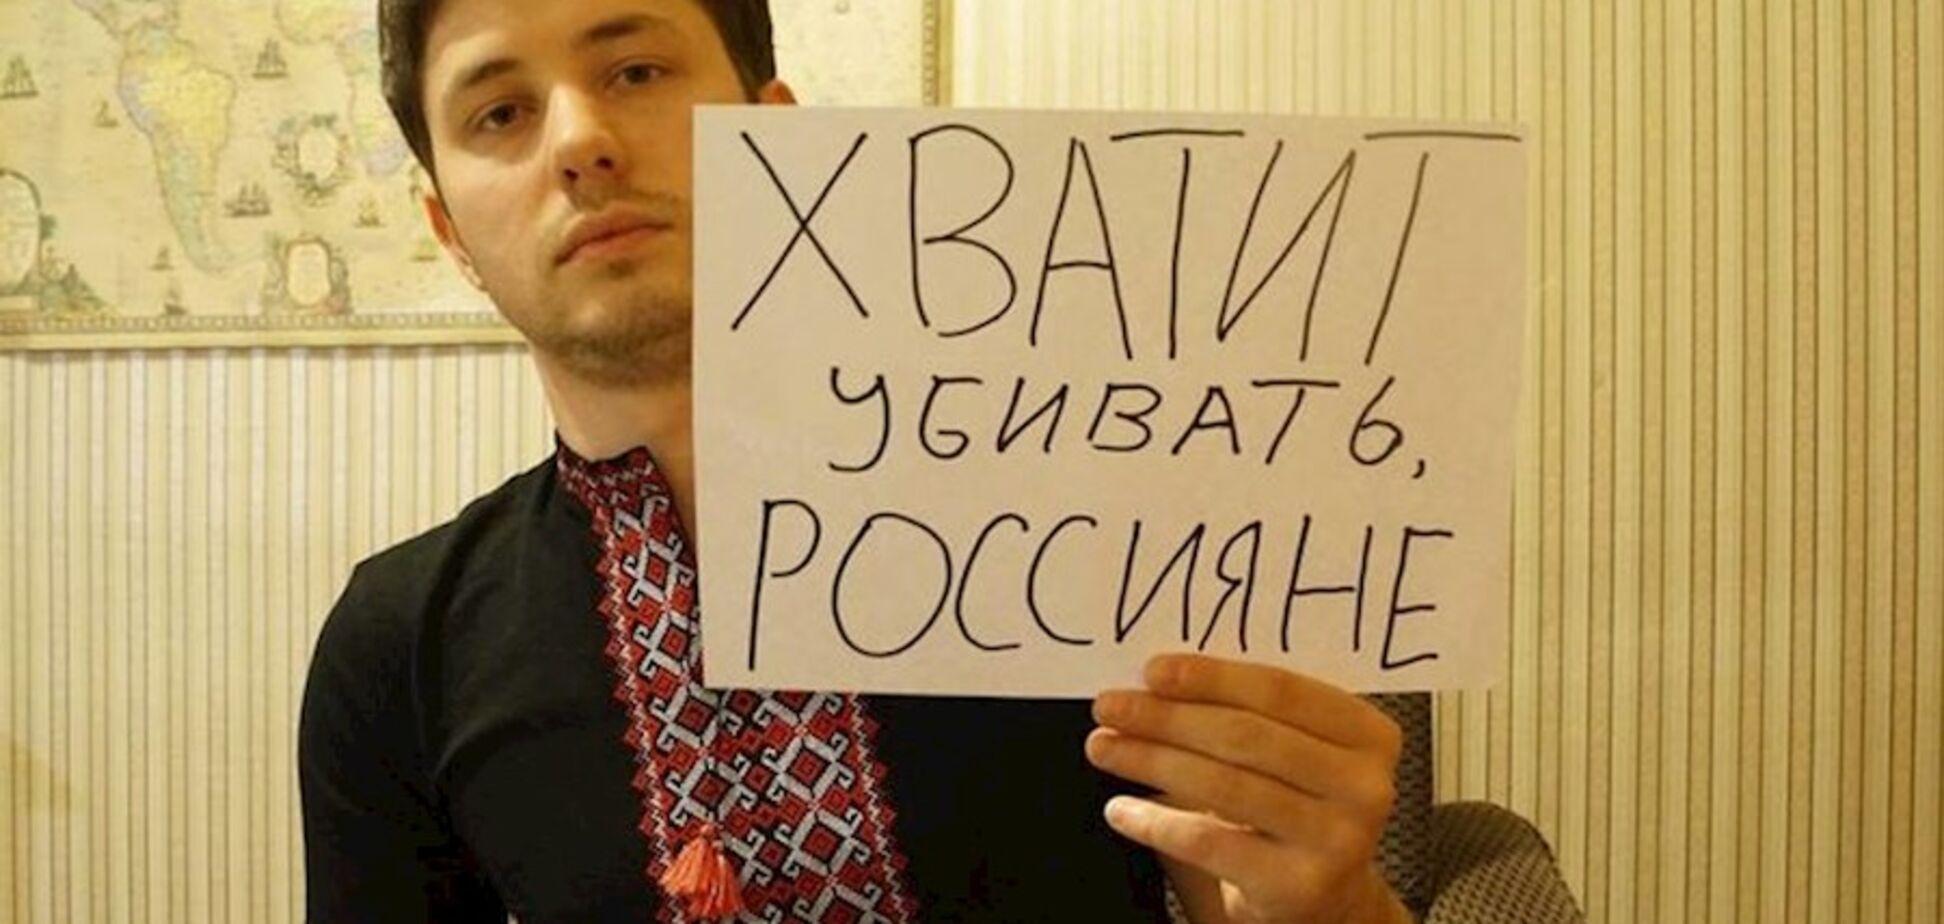 Олександр Тверськийй